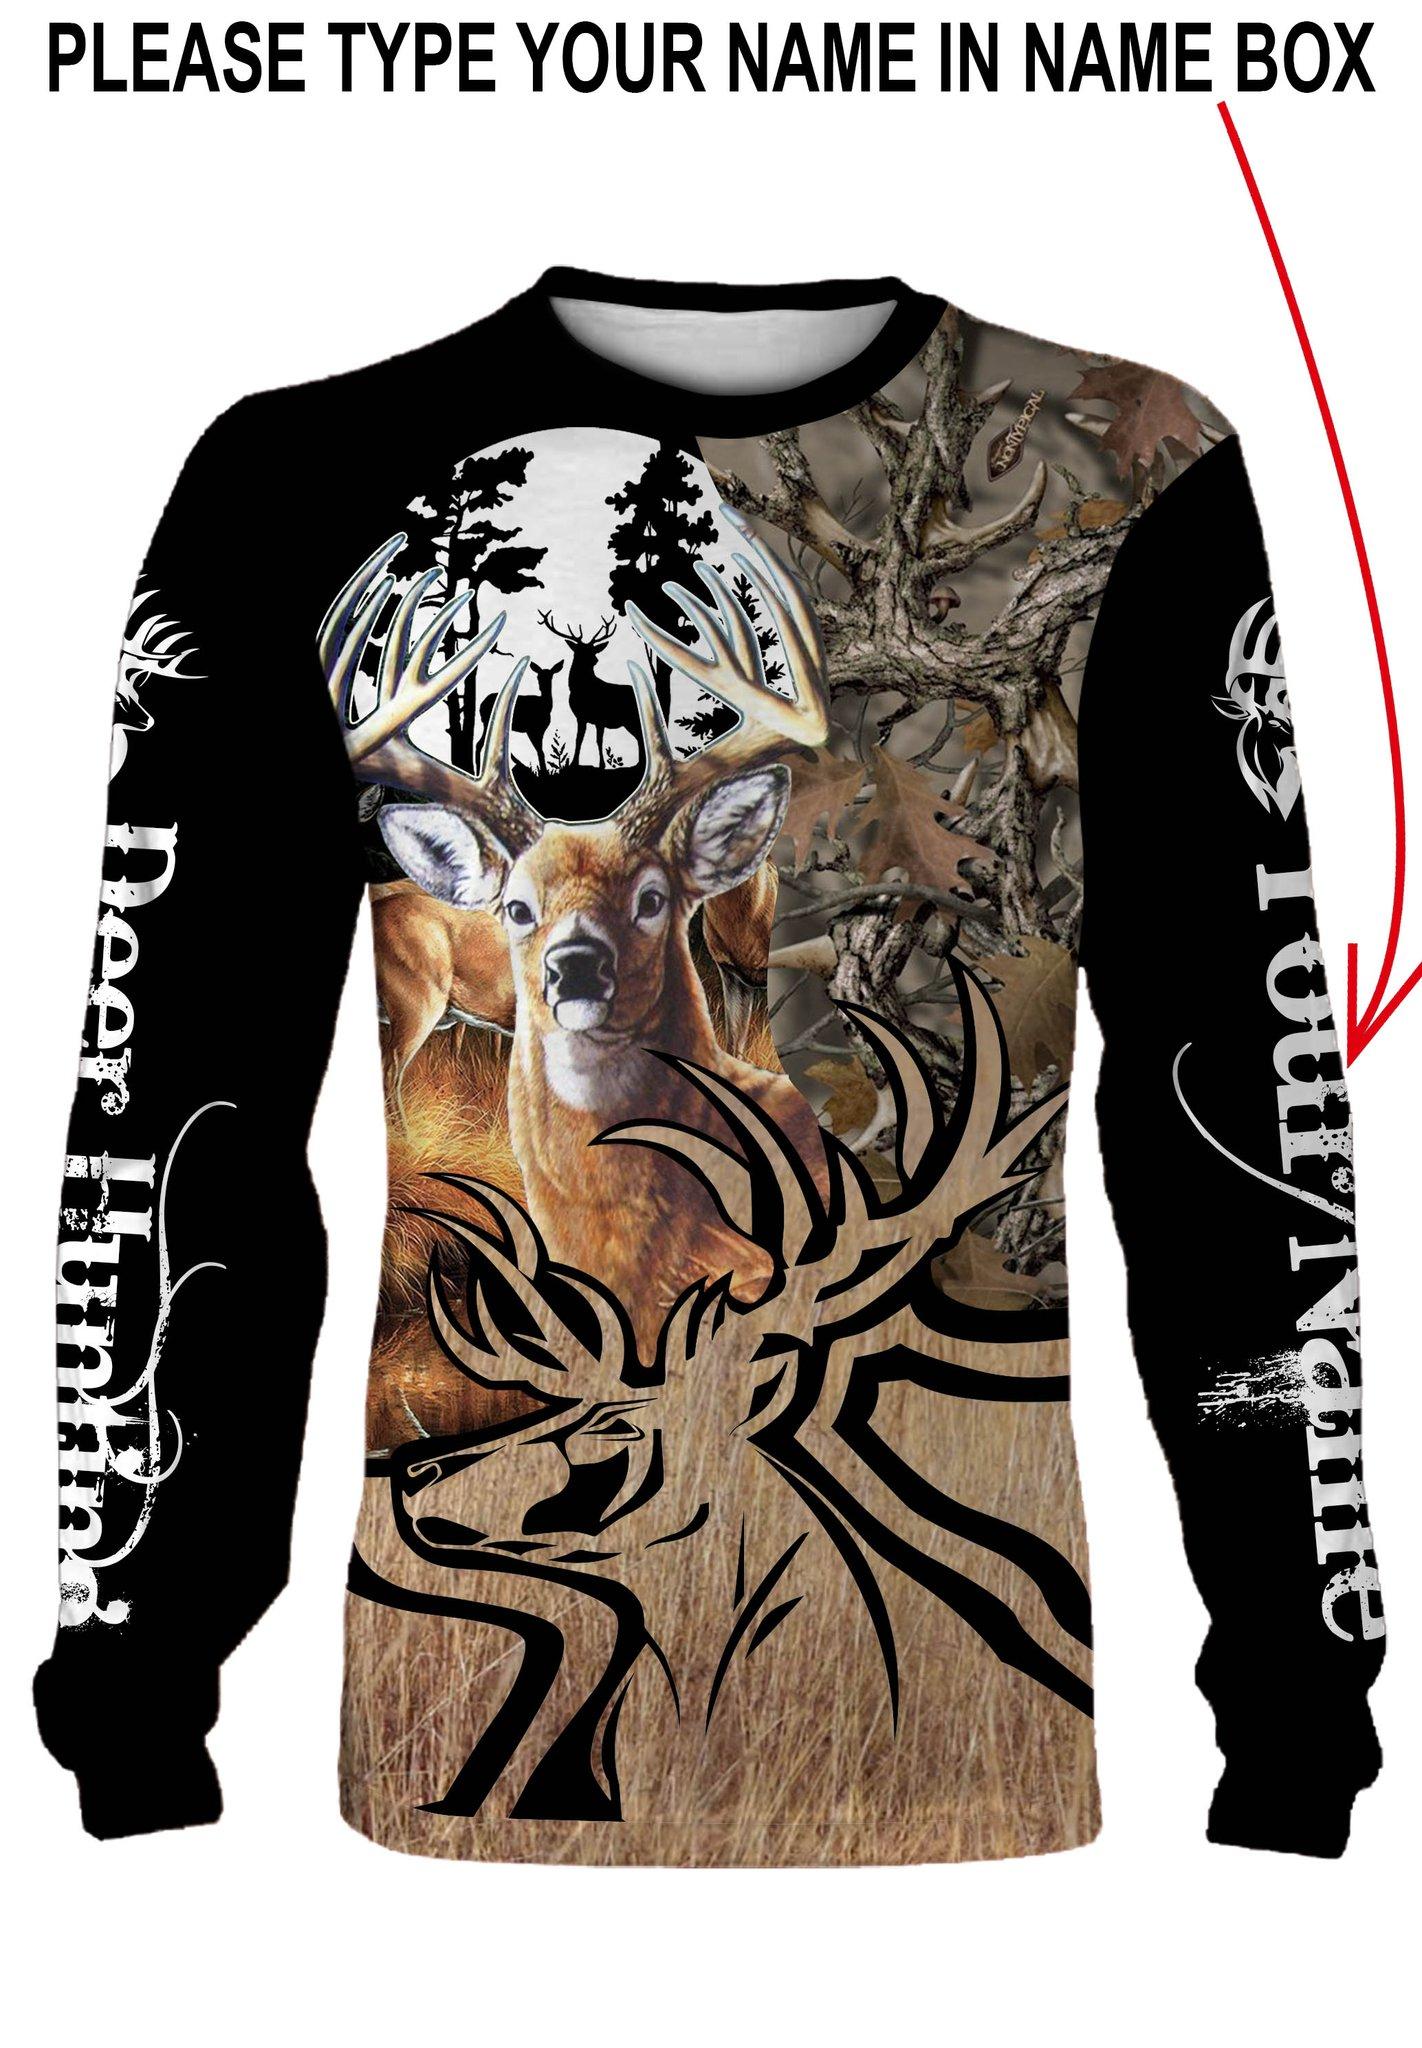 Deer hunting personalized full printing sweatshirt